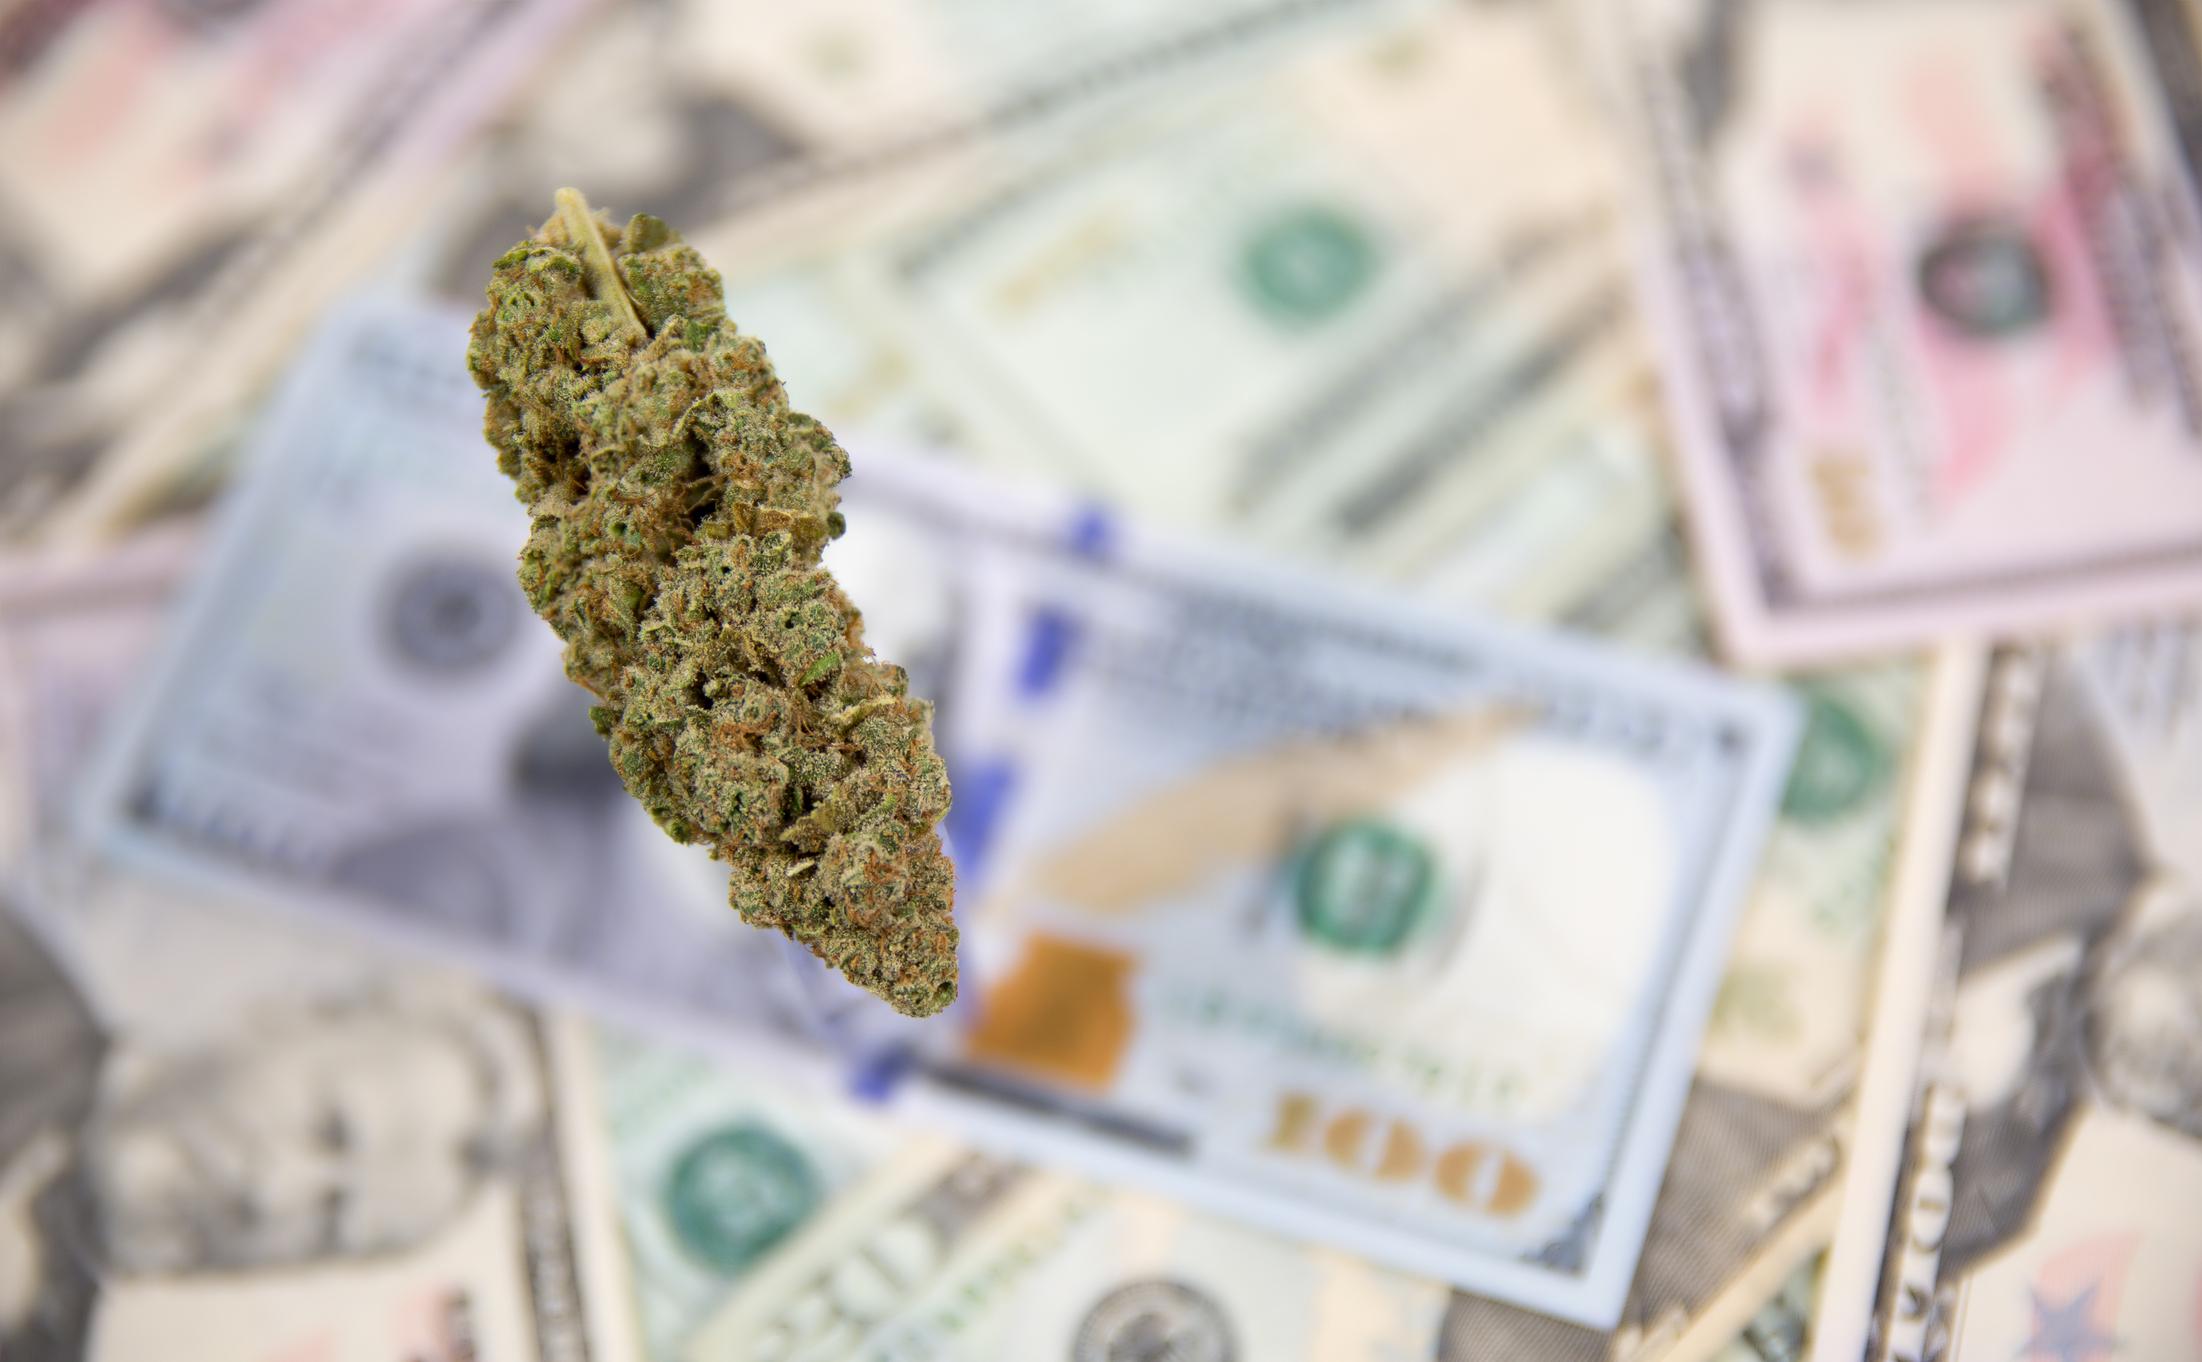 Marijuana bud against blurred background of money